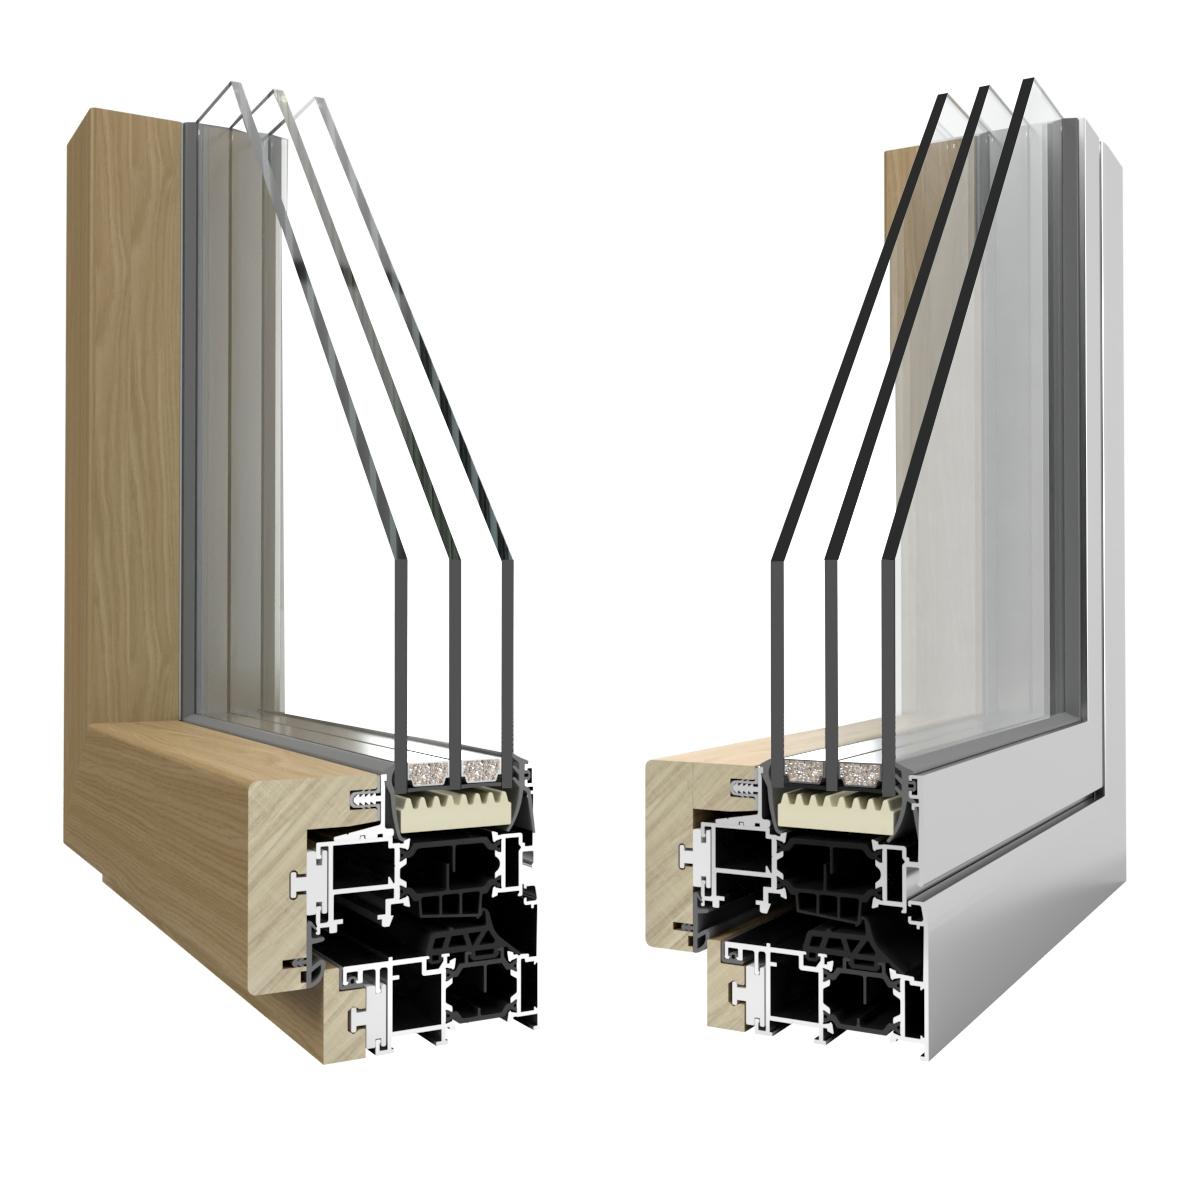 https://www.allpaint.it/wp-content/uploads/2021/07/finestre-alluminio-legno-tkwood-plus-allpaint.jpg